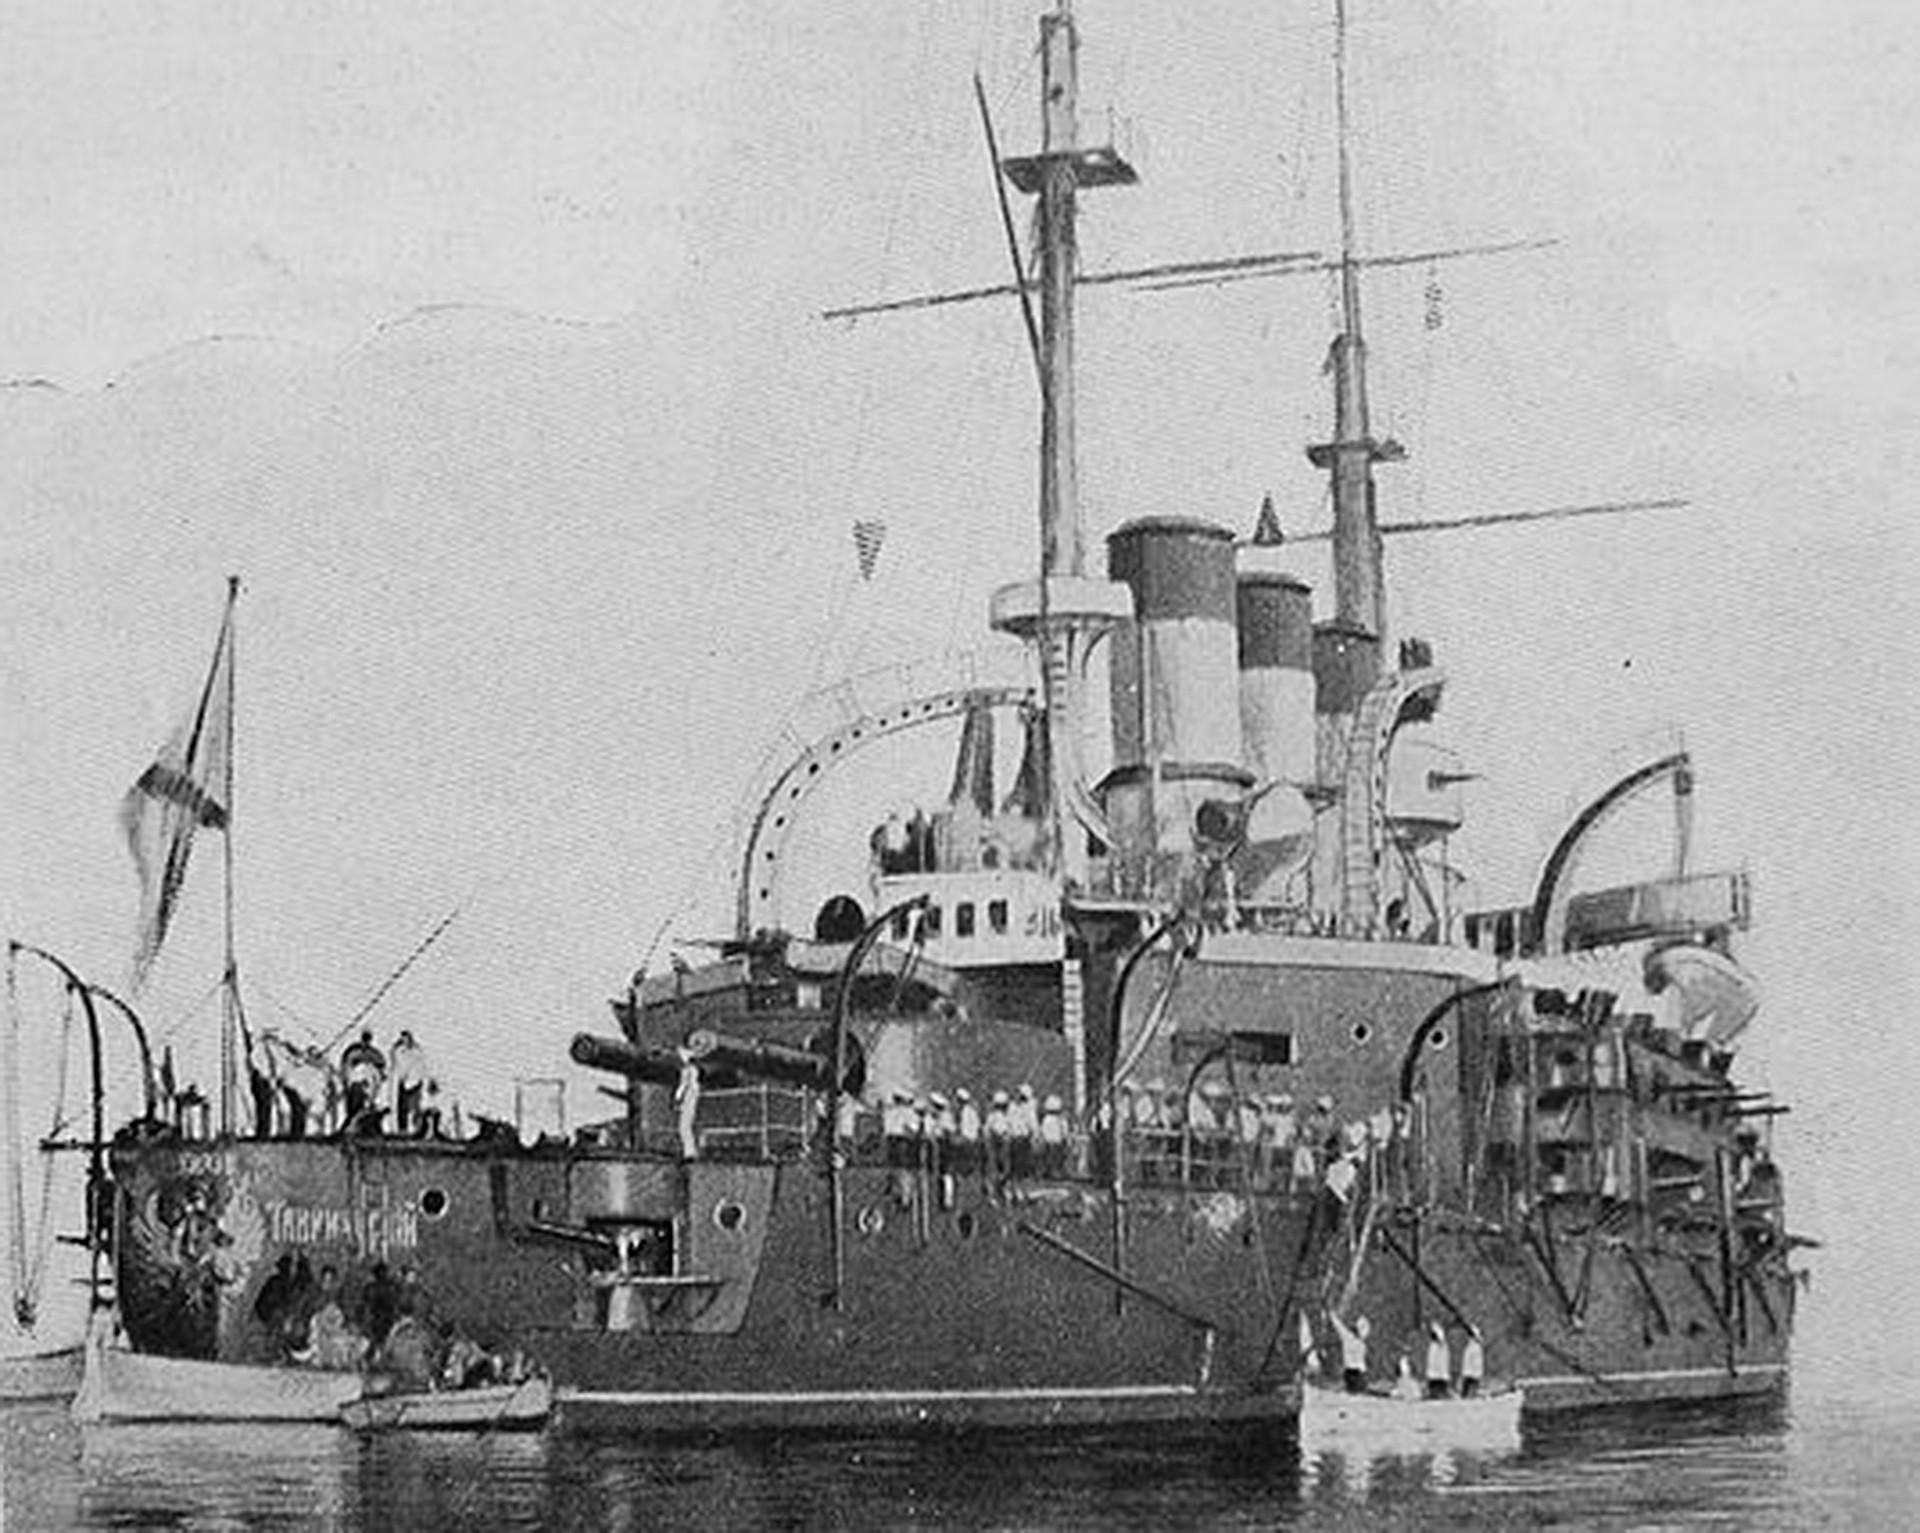 The battleship Potemkin at Constanta port in July 1905.